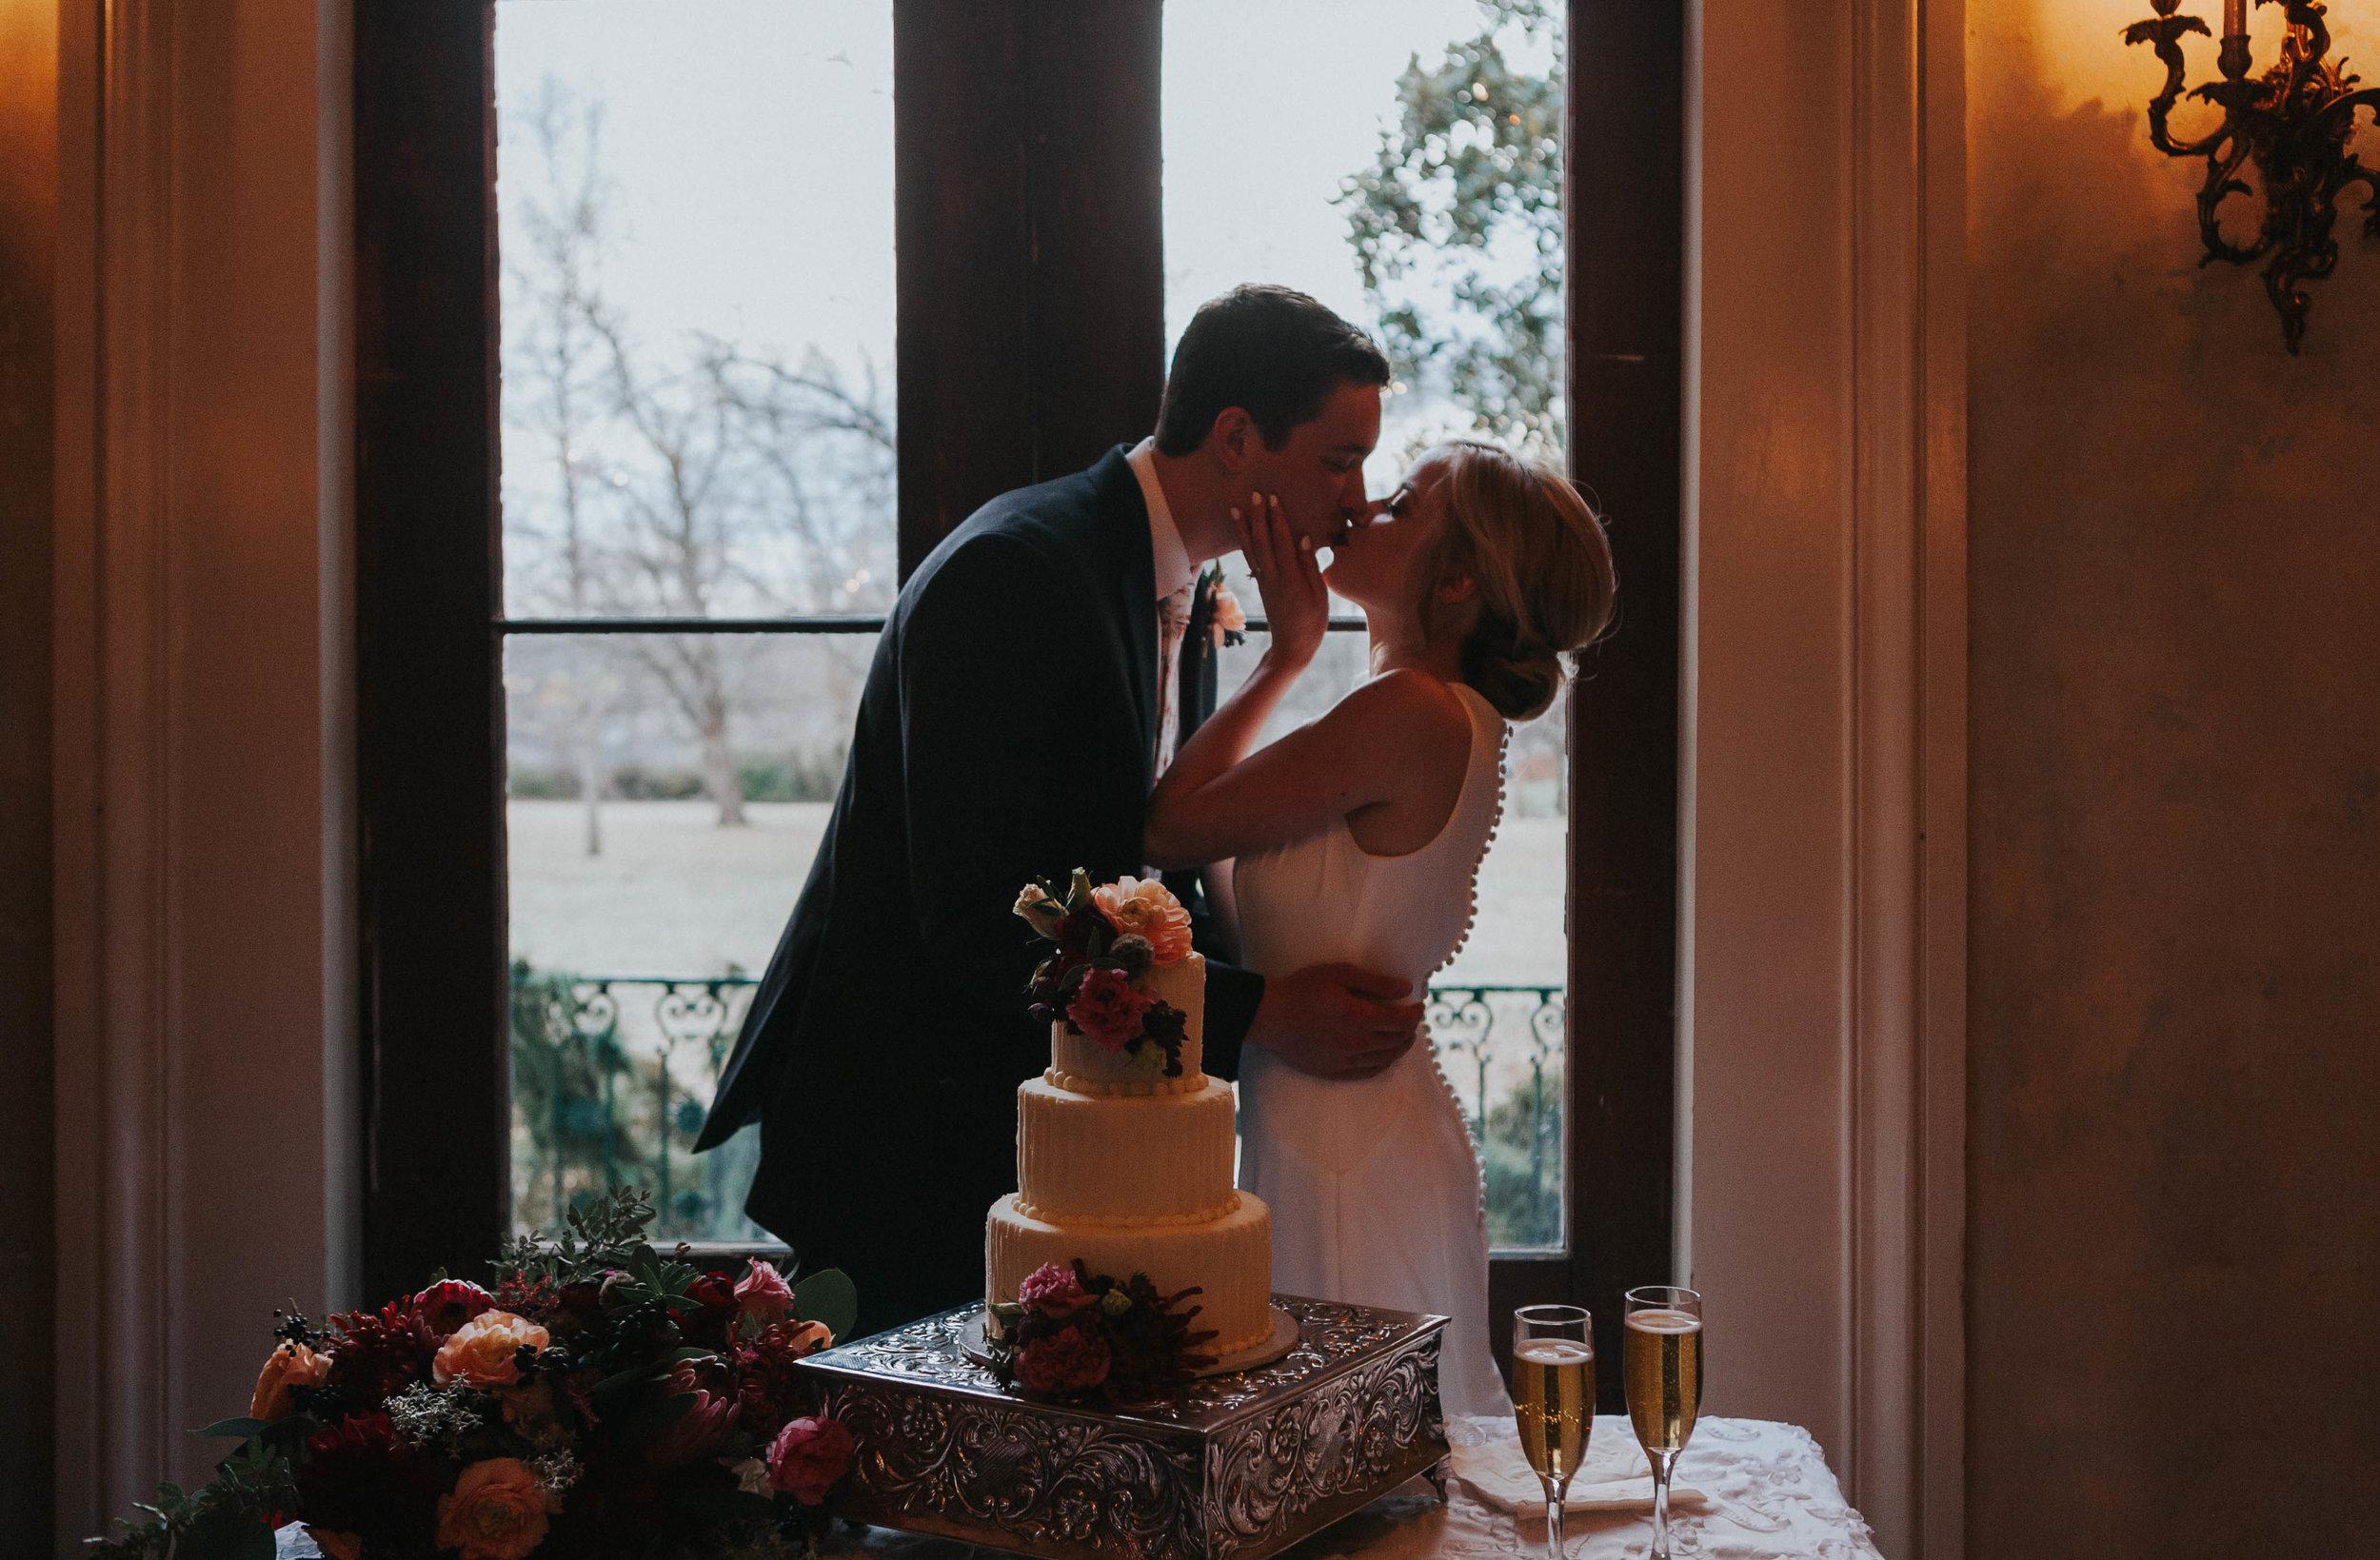 Charis_Lauren_Romantic_Wedding_Photographer_Nashville_0924.jpg